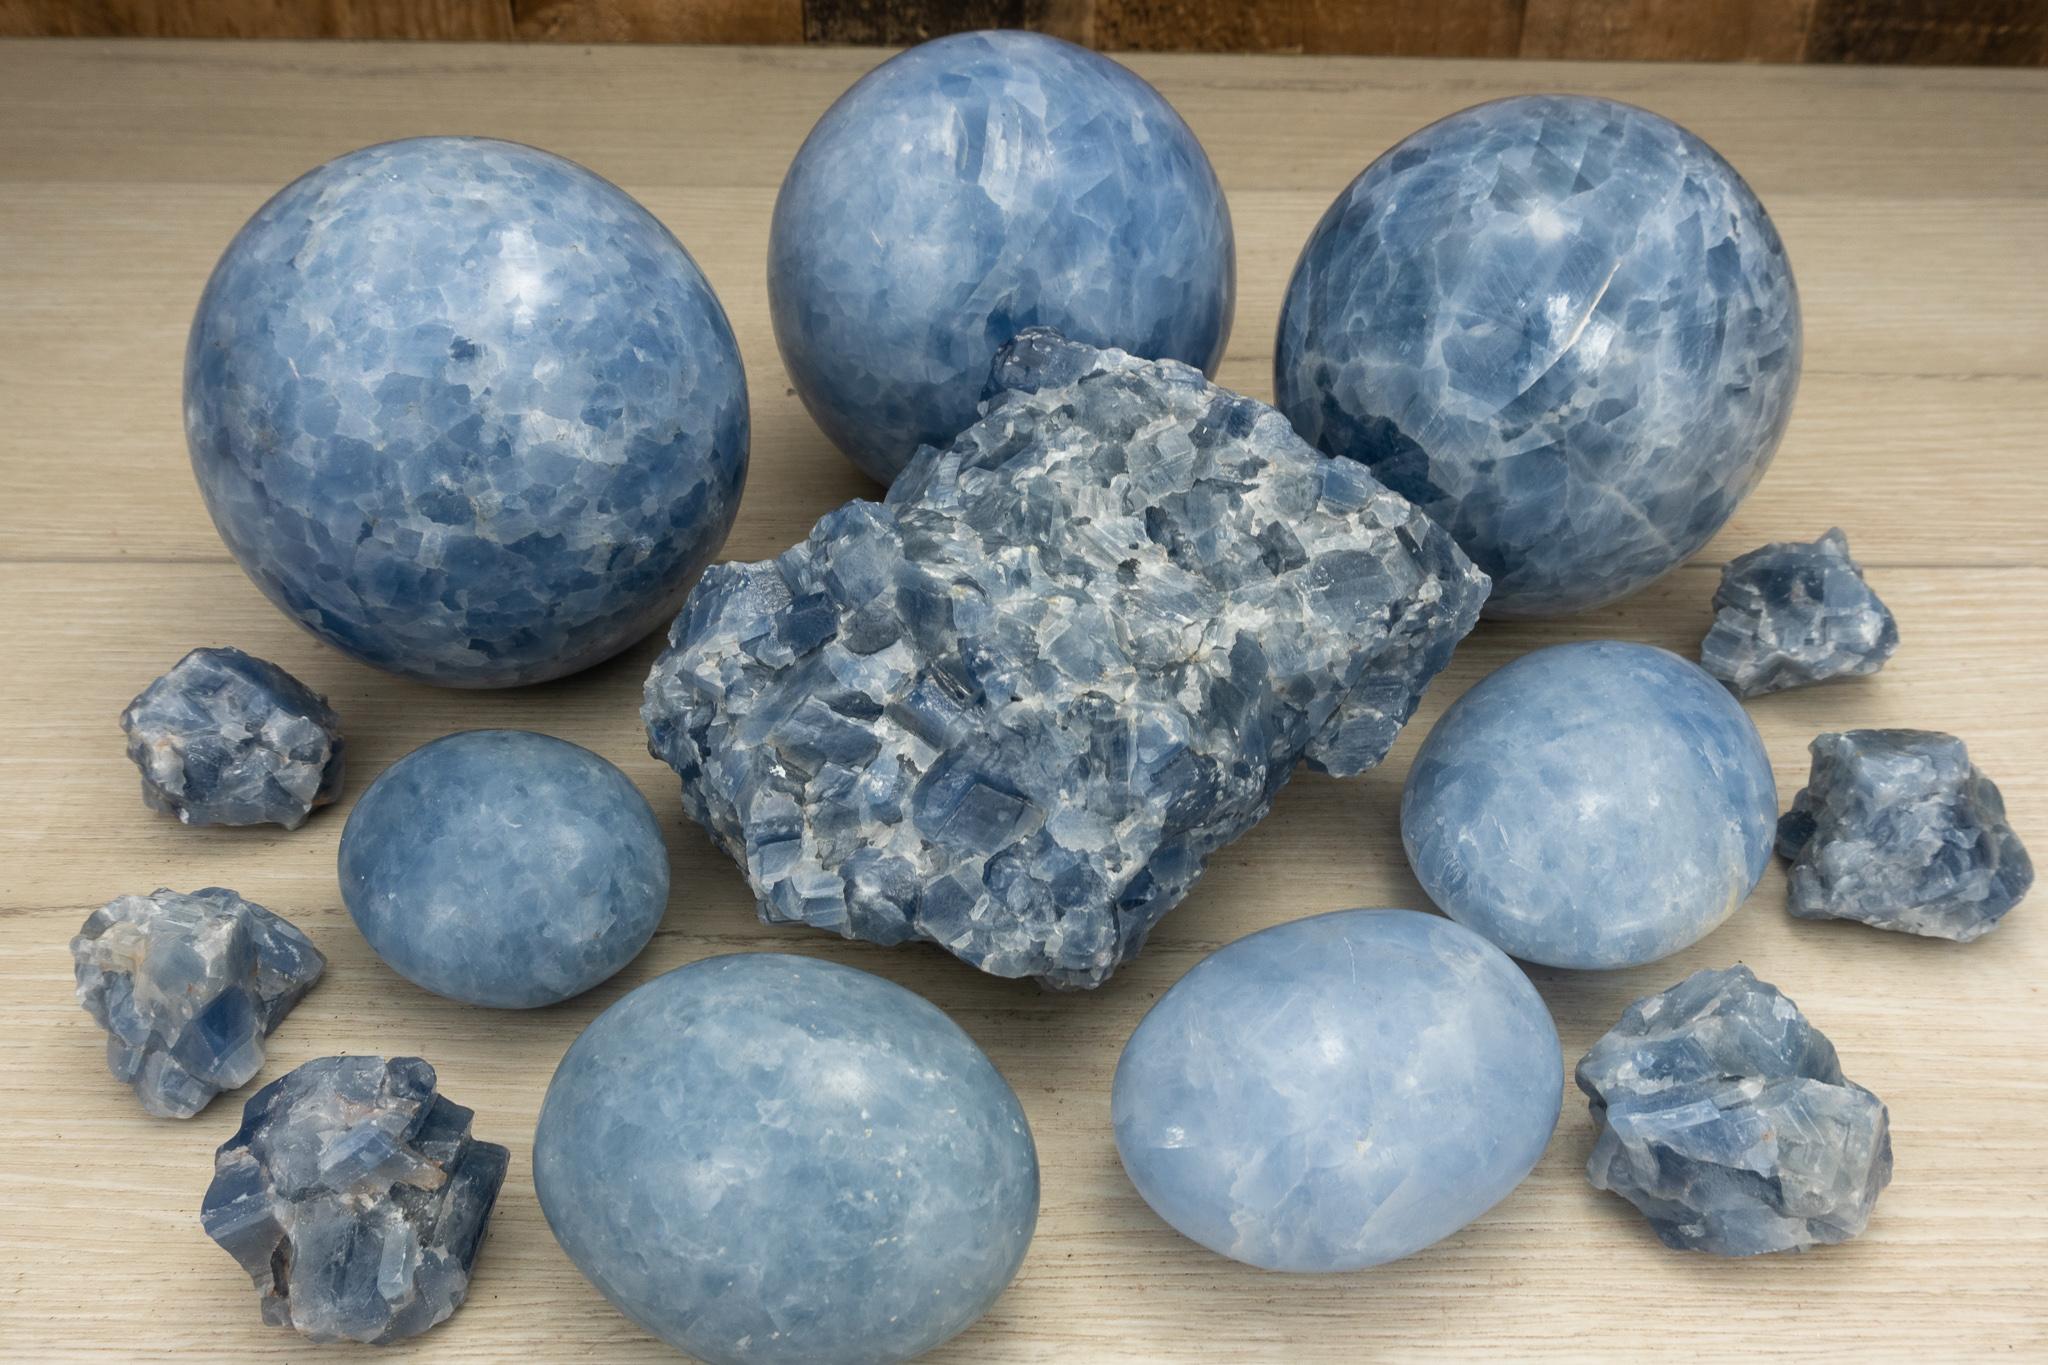 Blue Calcite Rough Stones Crystals Rocks Gemstone